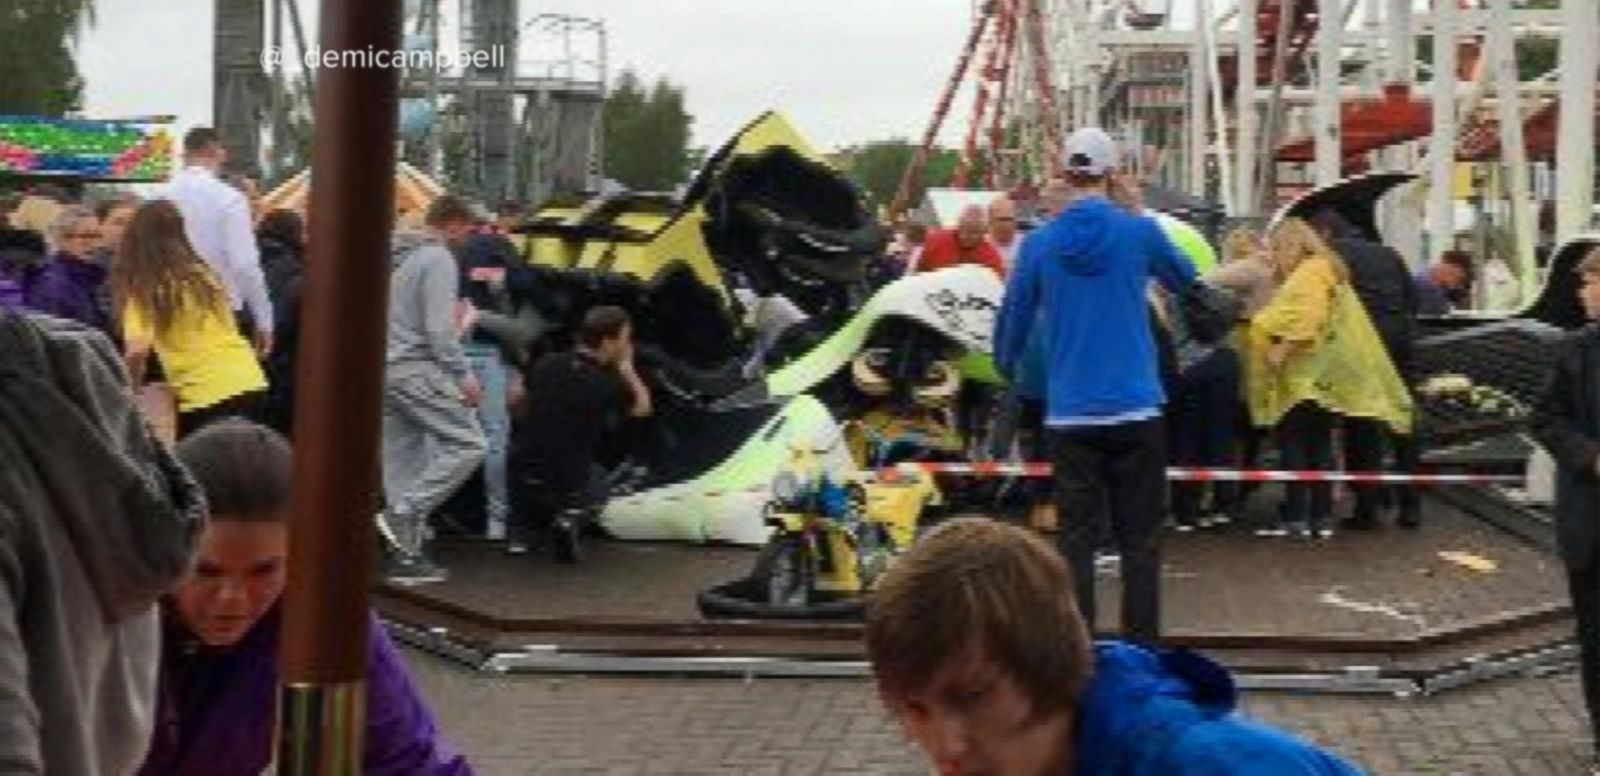 VIDEO: Roller Coaster Derails, Injuring 10 People